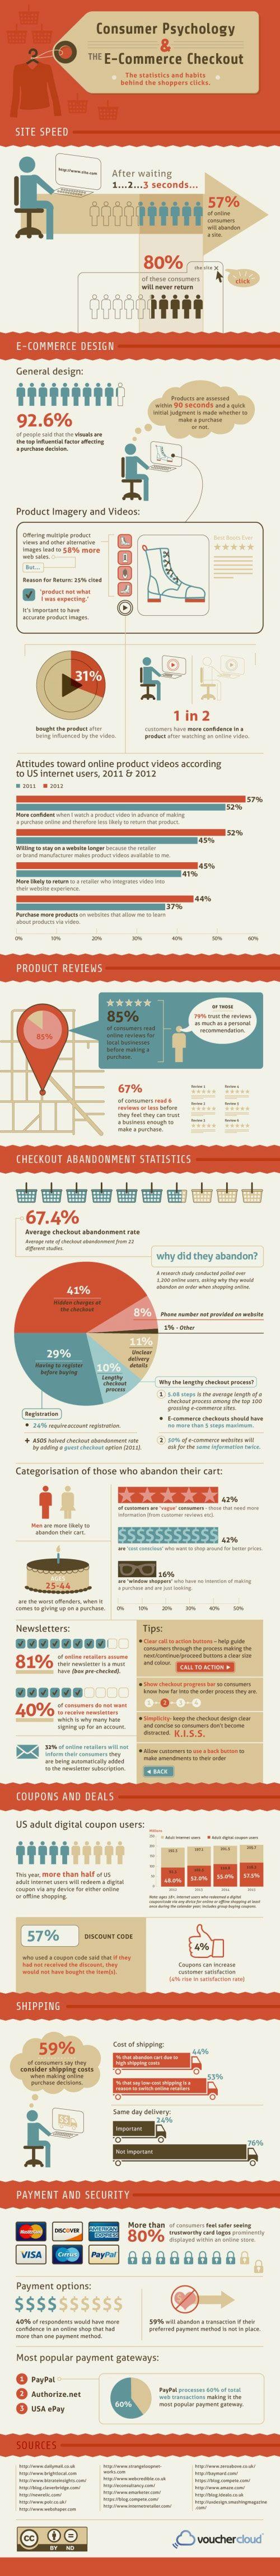 Consumer Psychology & Ecommerce Checkout